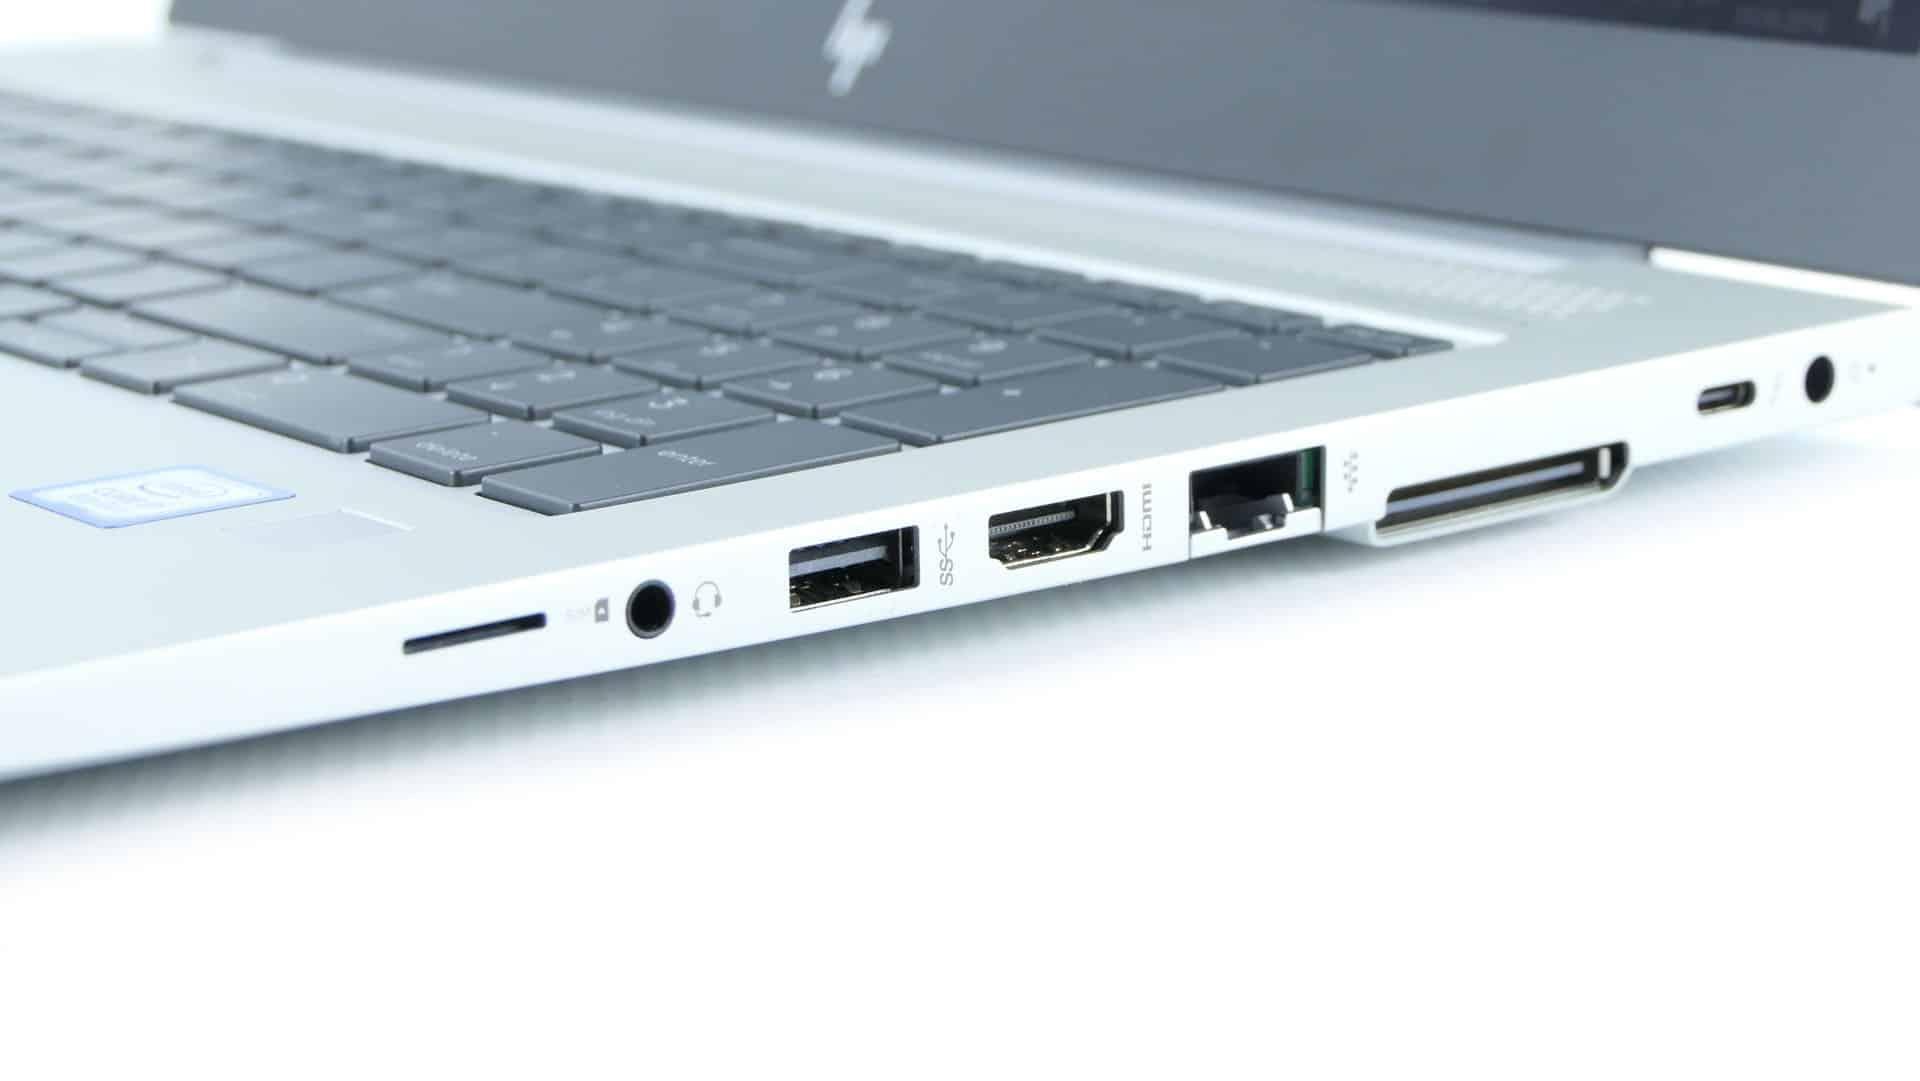 HP EliteBook 850 G5 - gniazdo SIM, port audio,  USB 3.0, HDMI, LAN, gniazdo dokowania, Thunderbolt 3